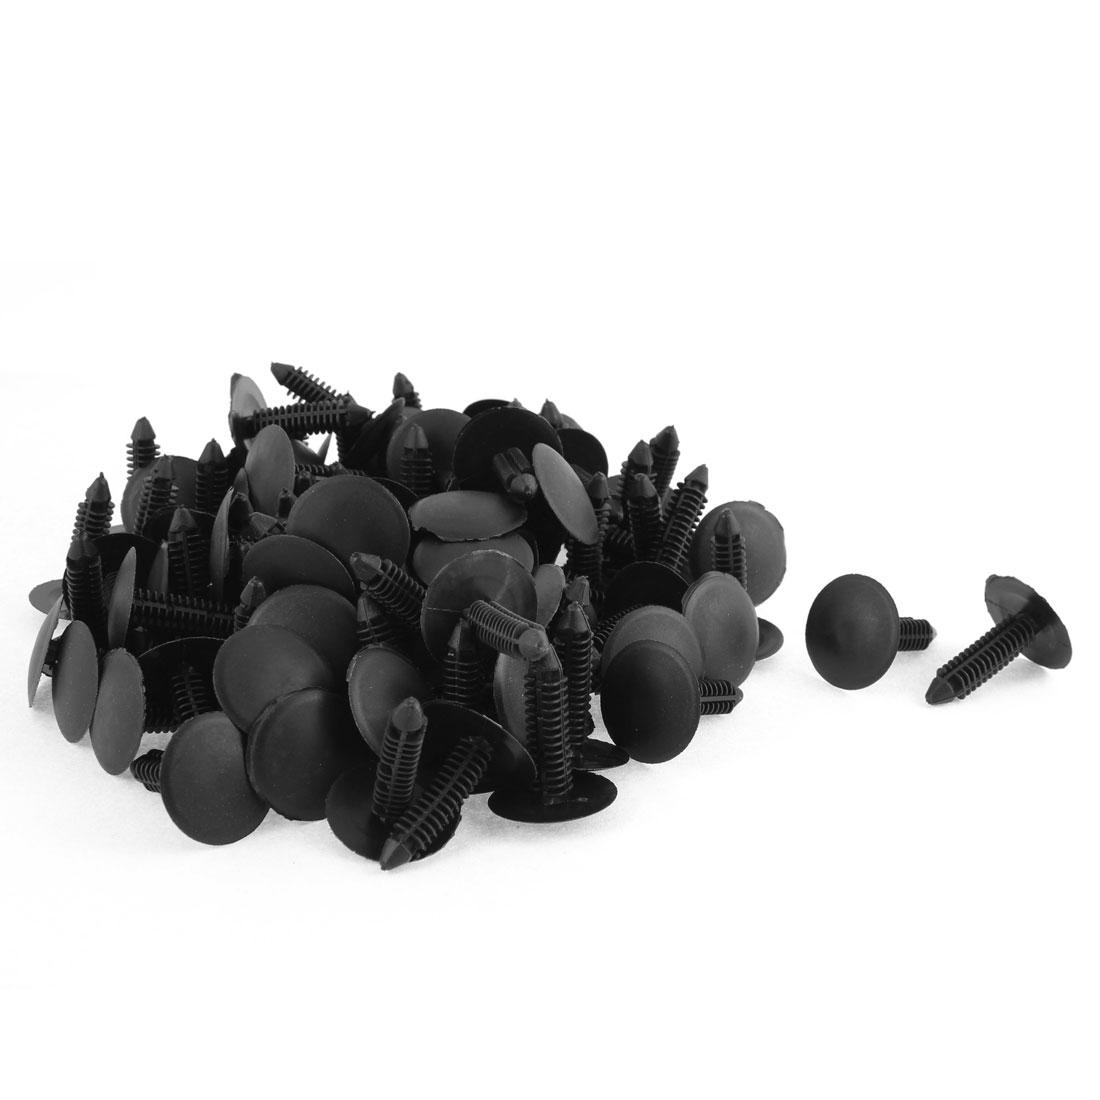 100 Pcs Black Plastic Rivet Buckle Ceiling Lining Trim Panel Retainer Fastener Clips